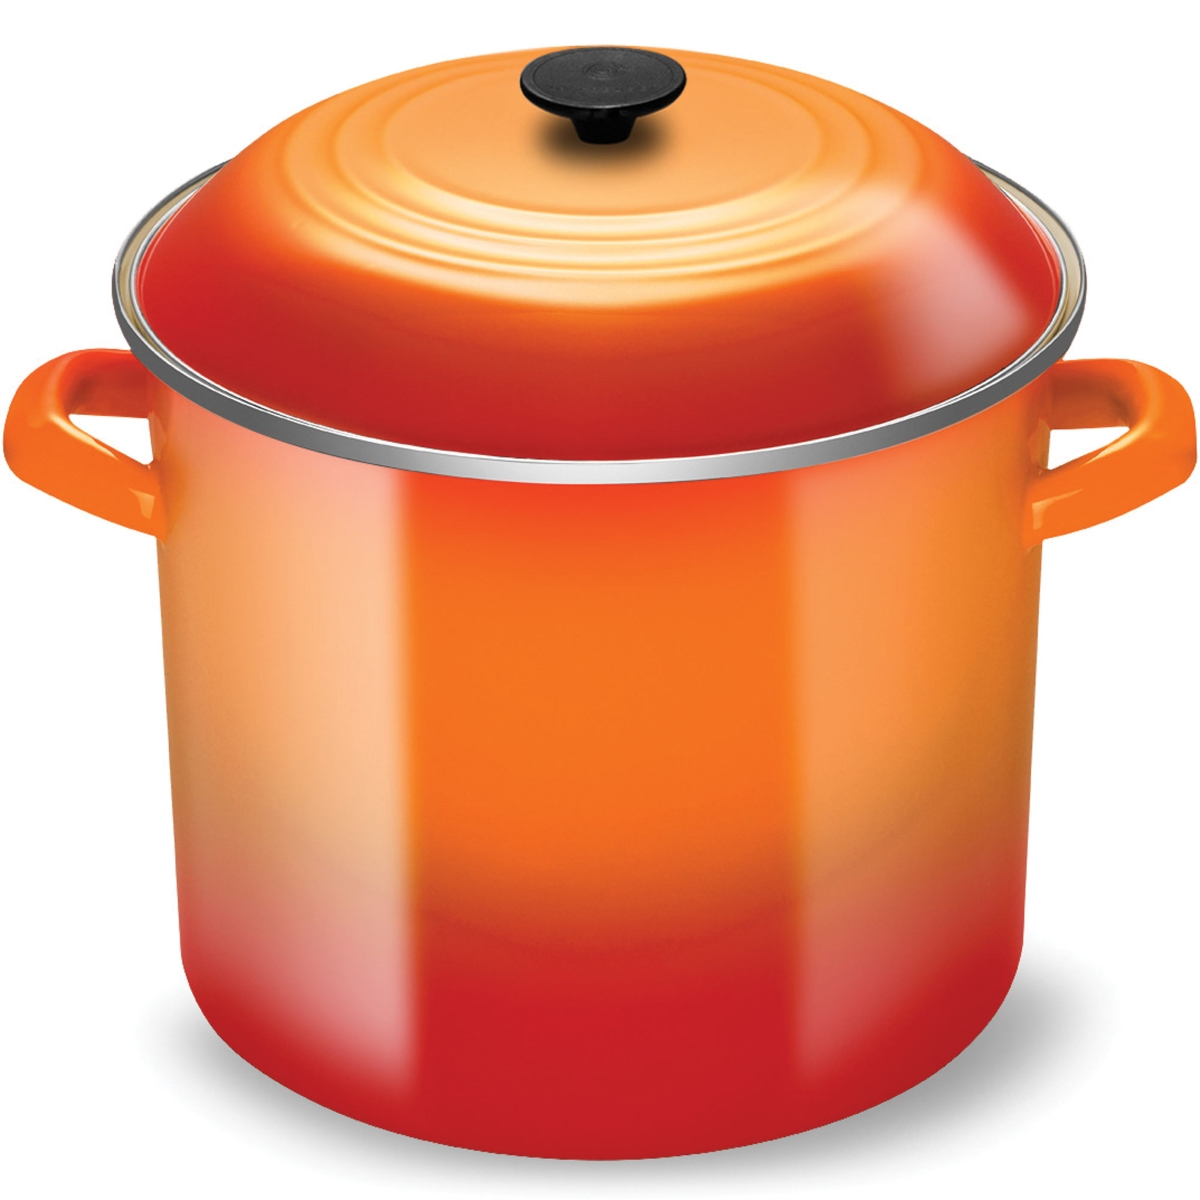 Le Creuset Enameled Steel 20-quart Flame Stock Pot